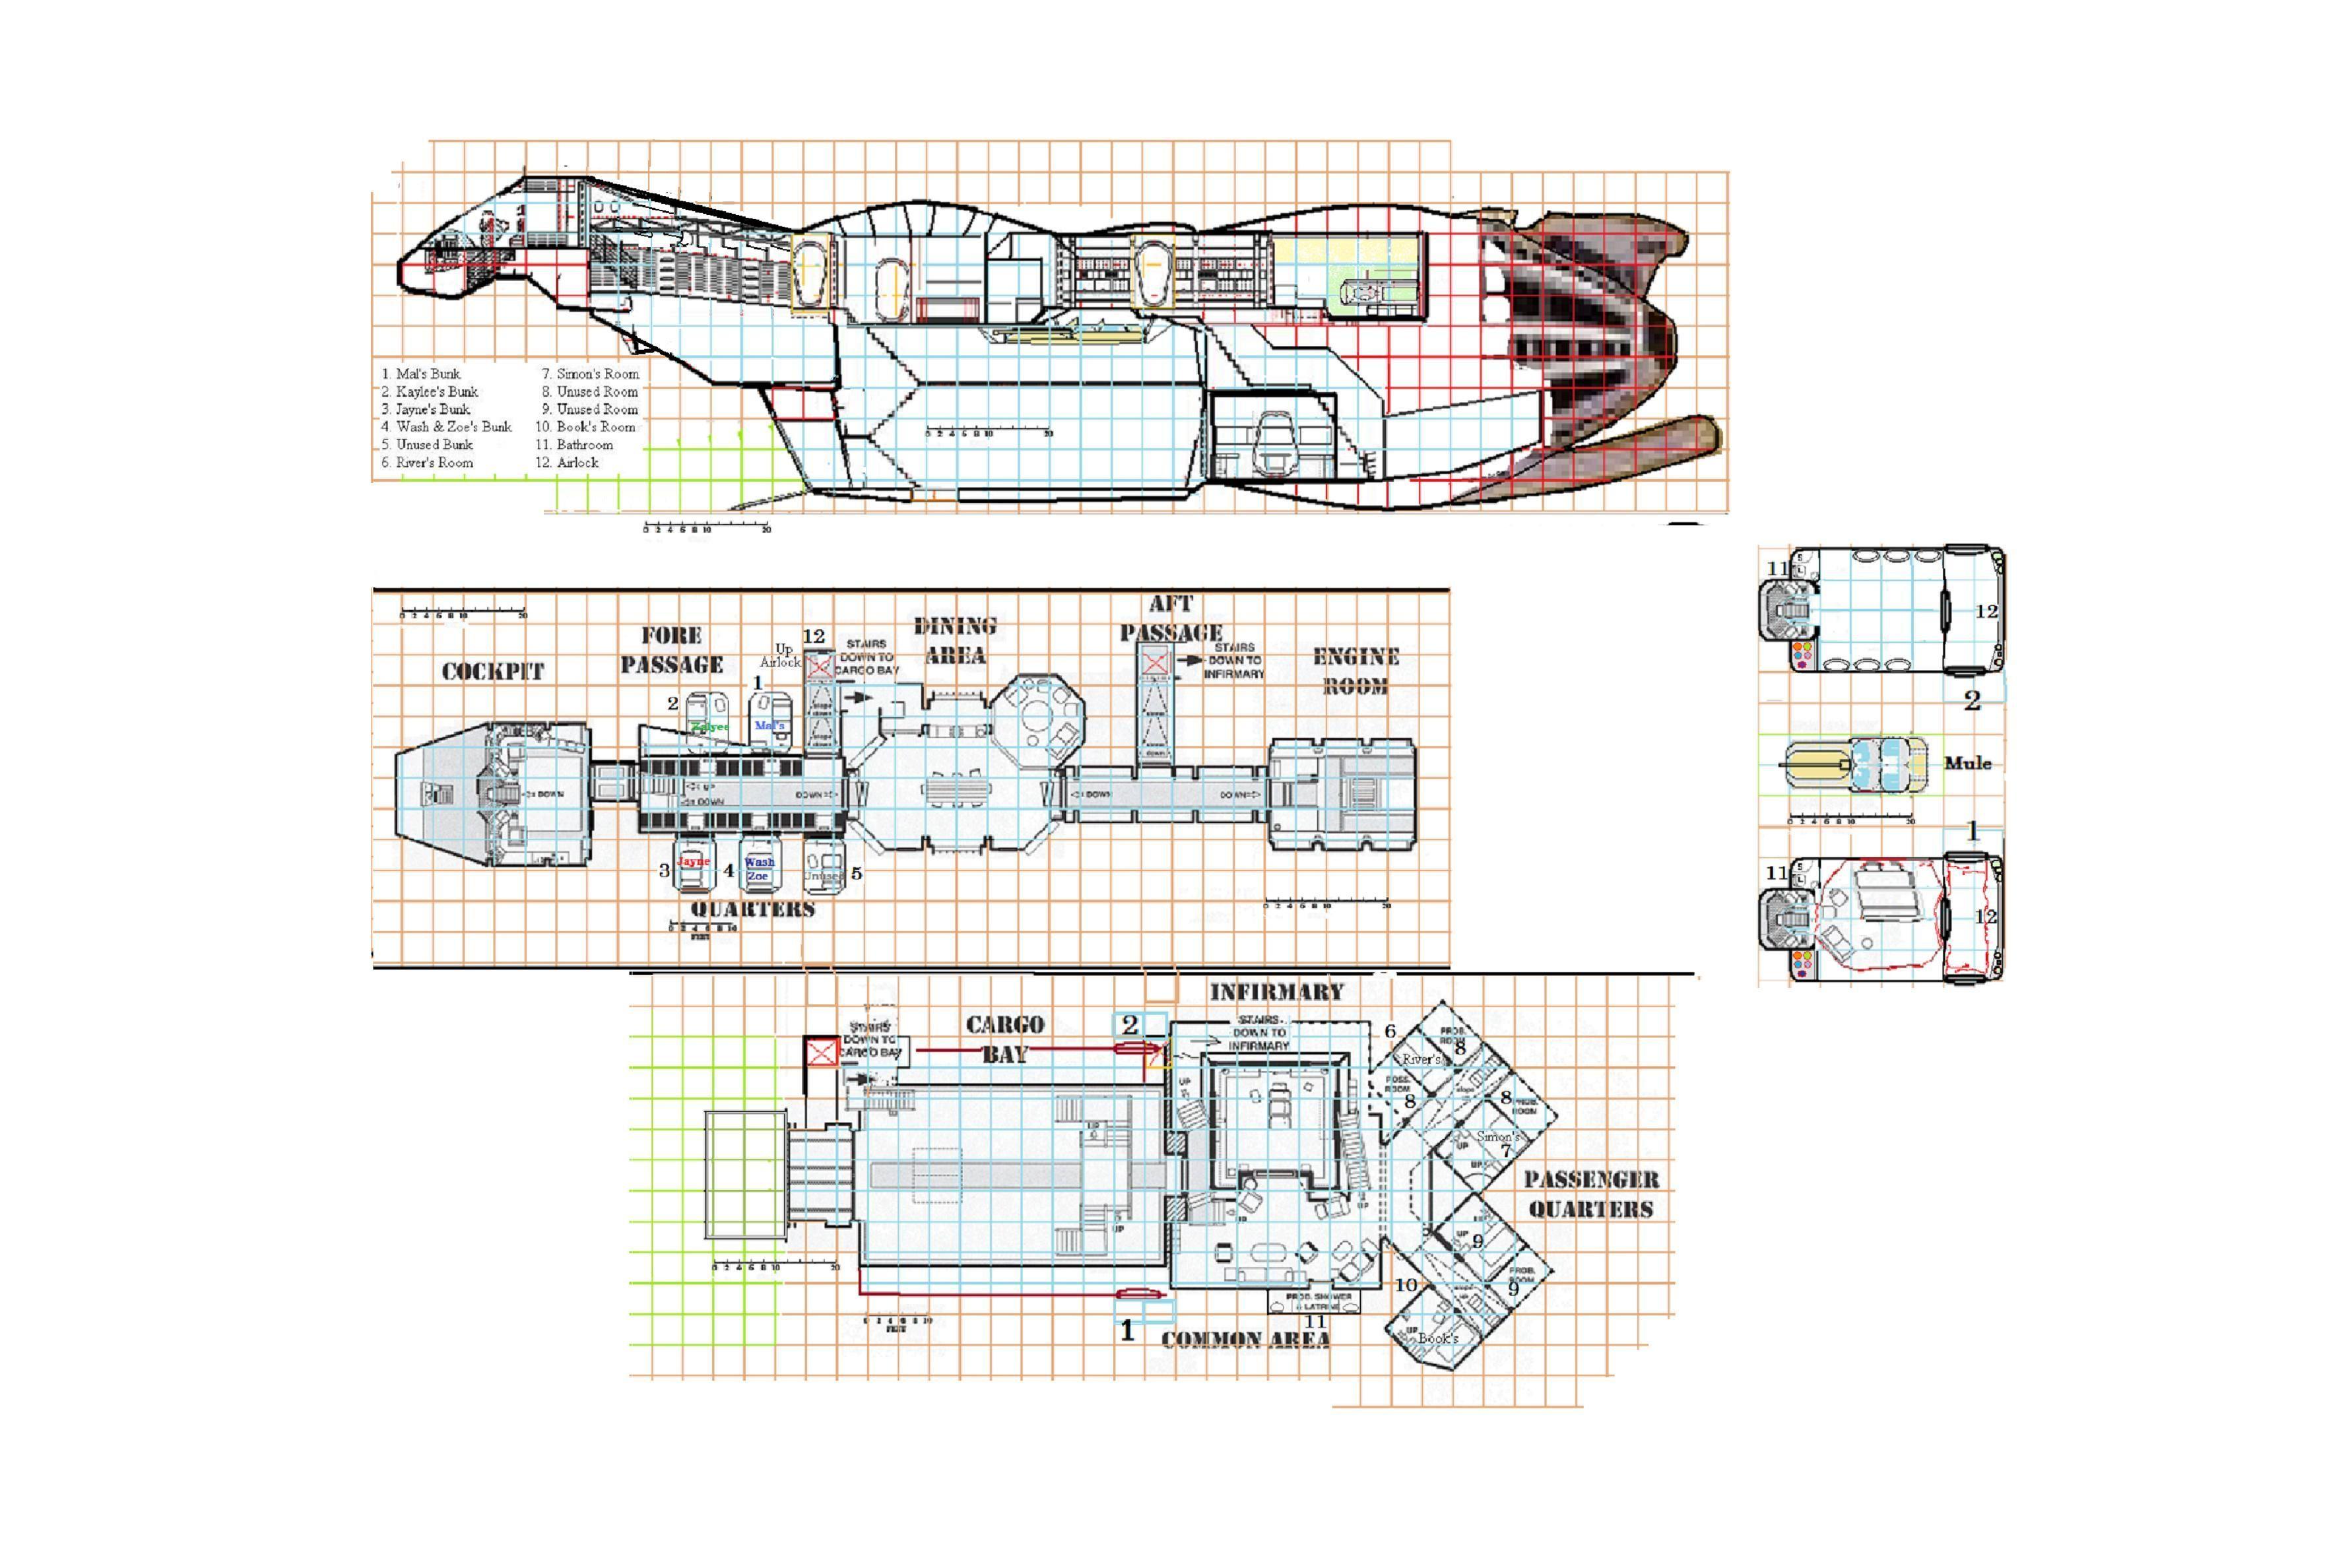 Serenity Ship Schematics - Bing Images Firefly Ship, Serenity Ship,  Fireflies, Bing Images